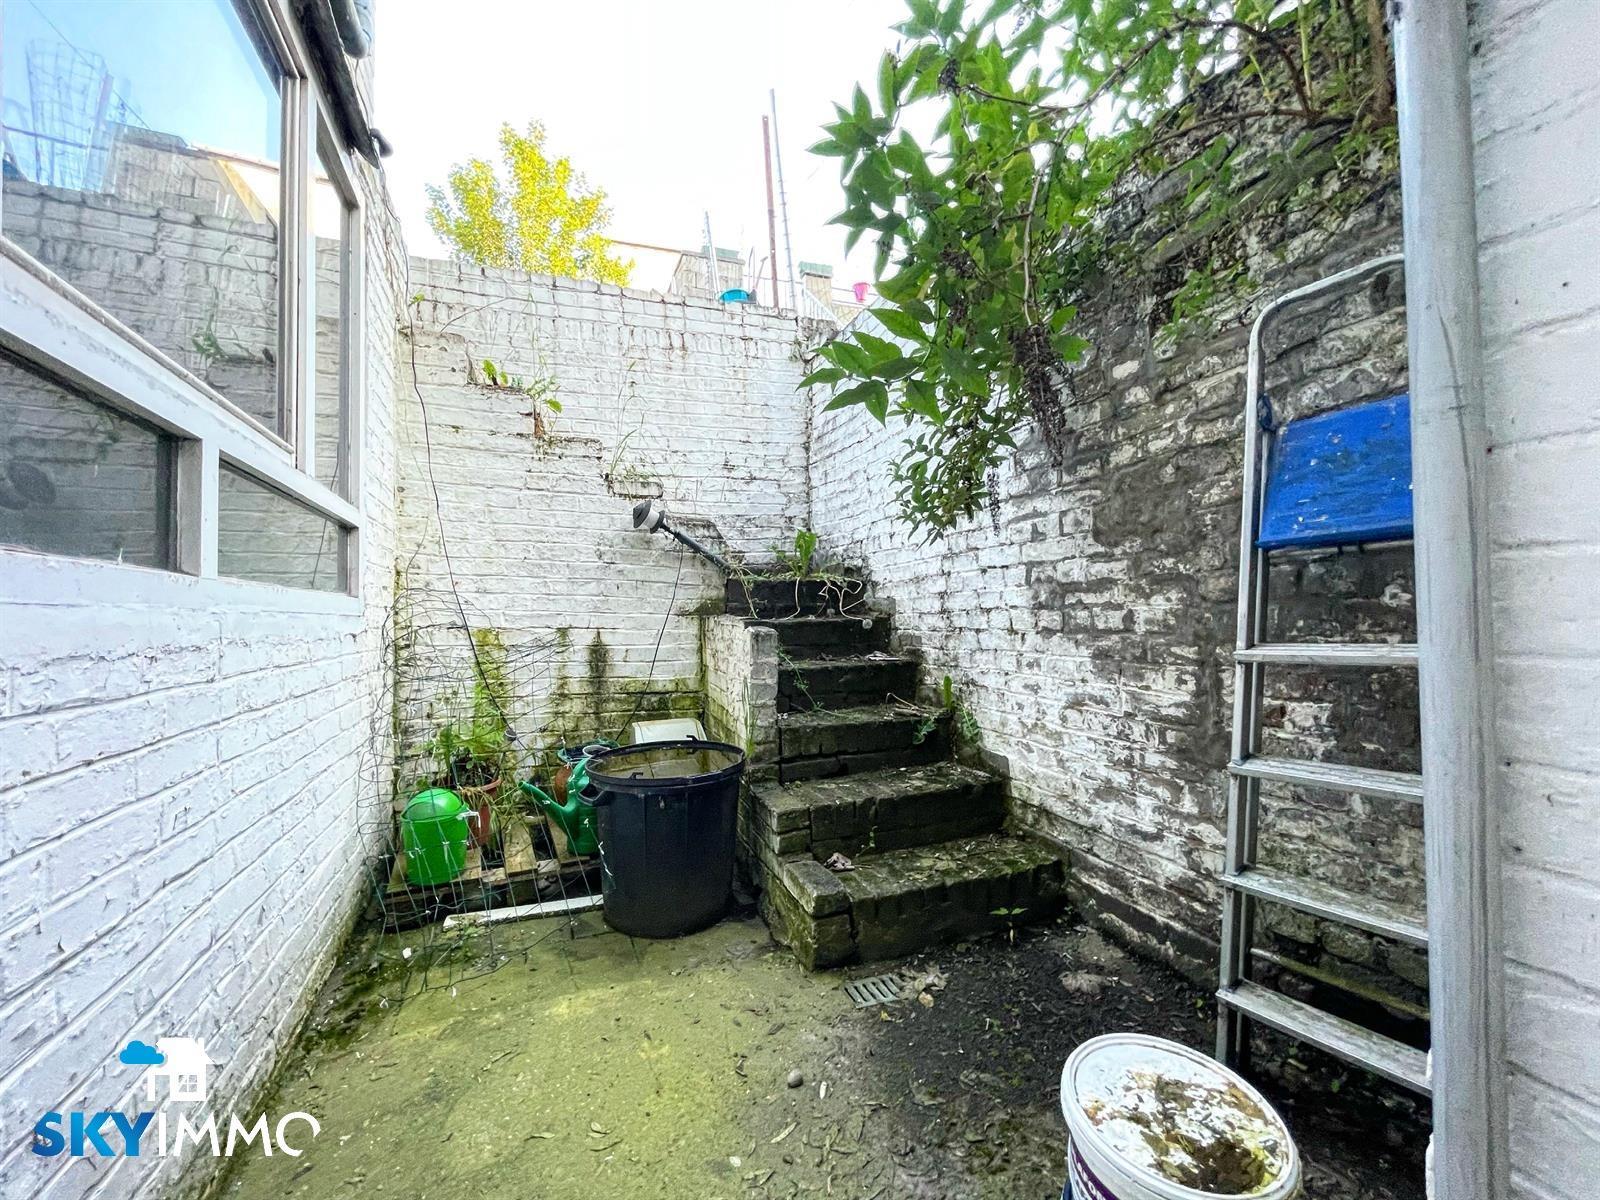 Maison - Seraing Jemeppesur-Meuse - #4383857-9